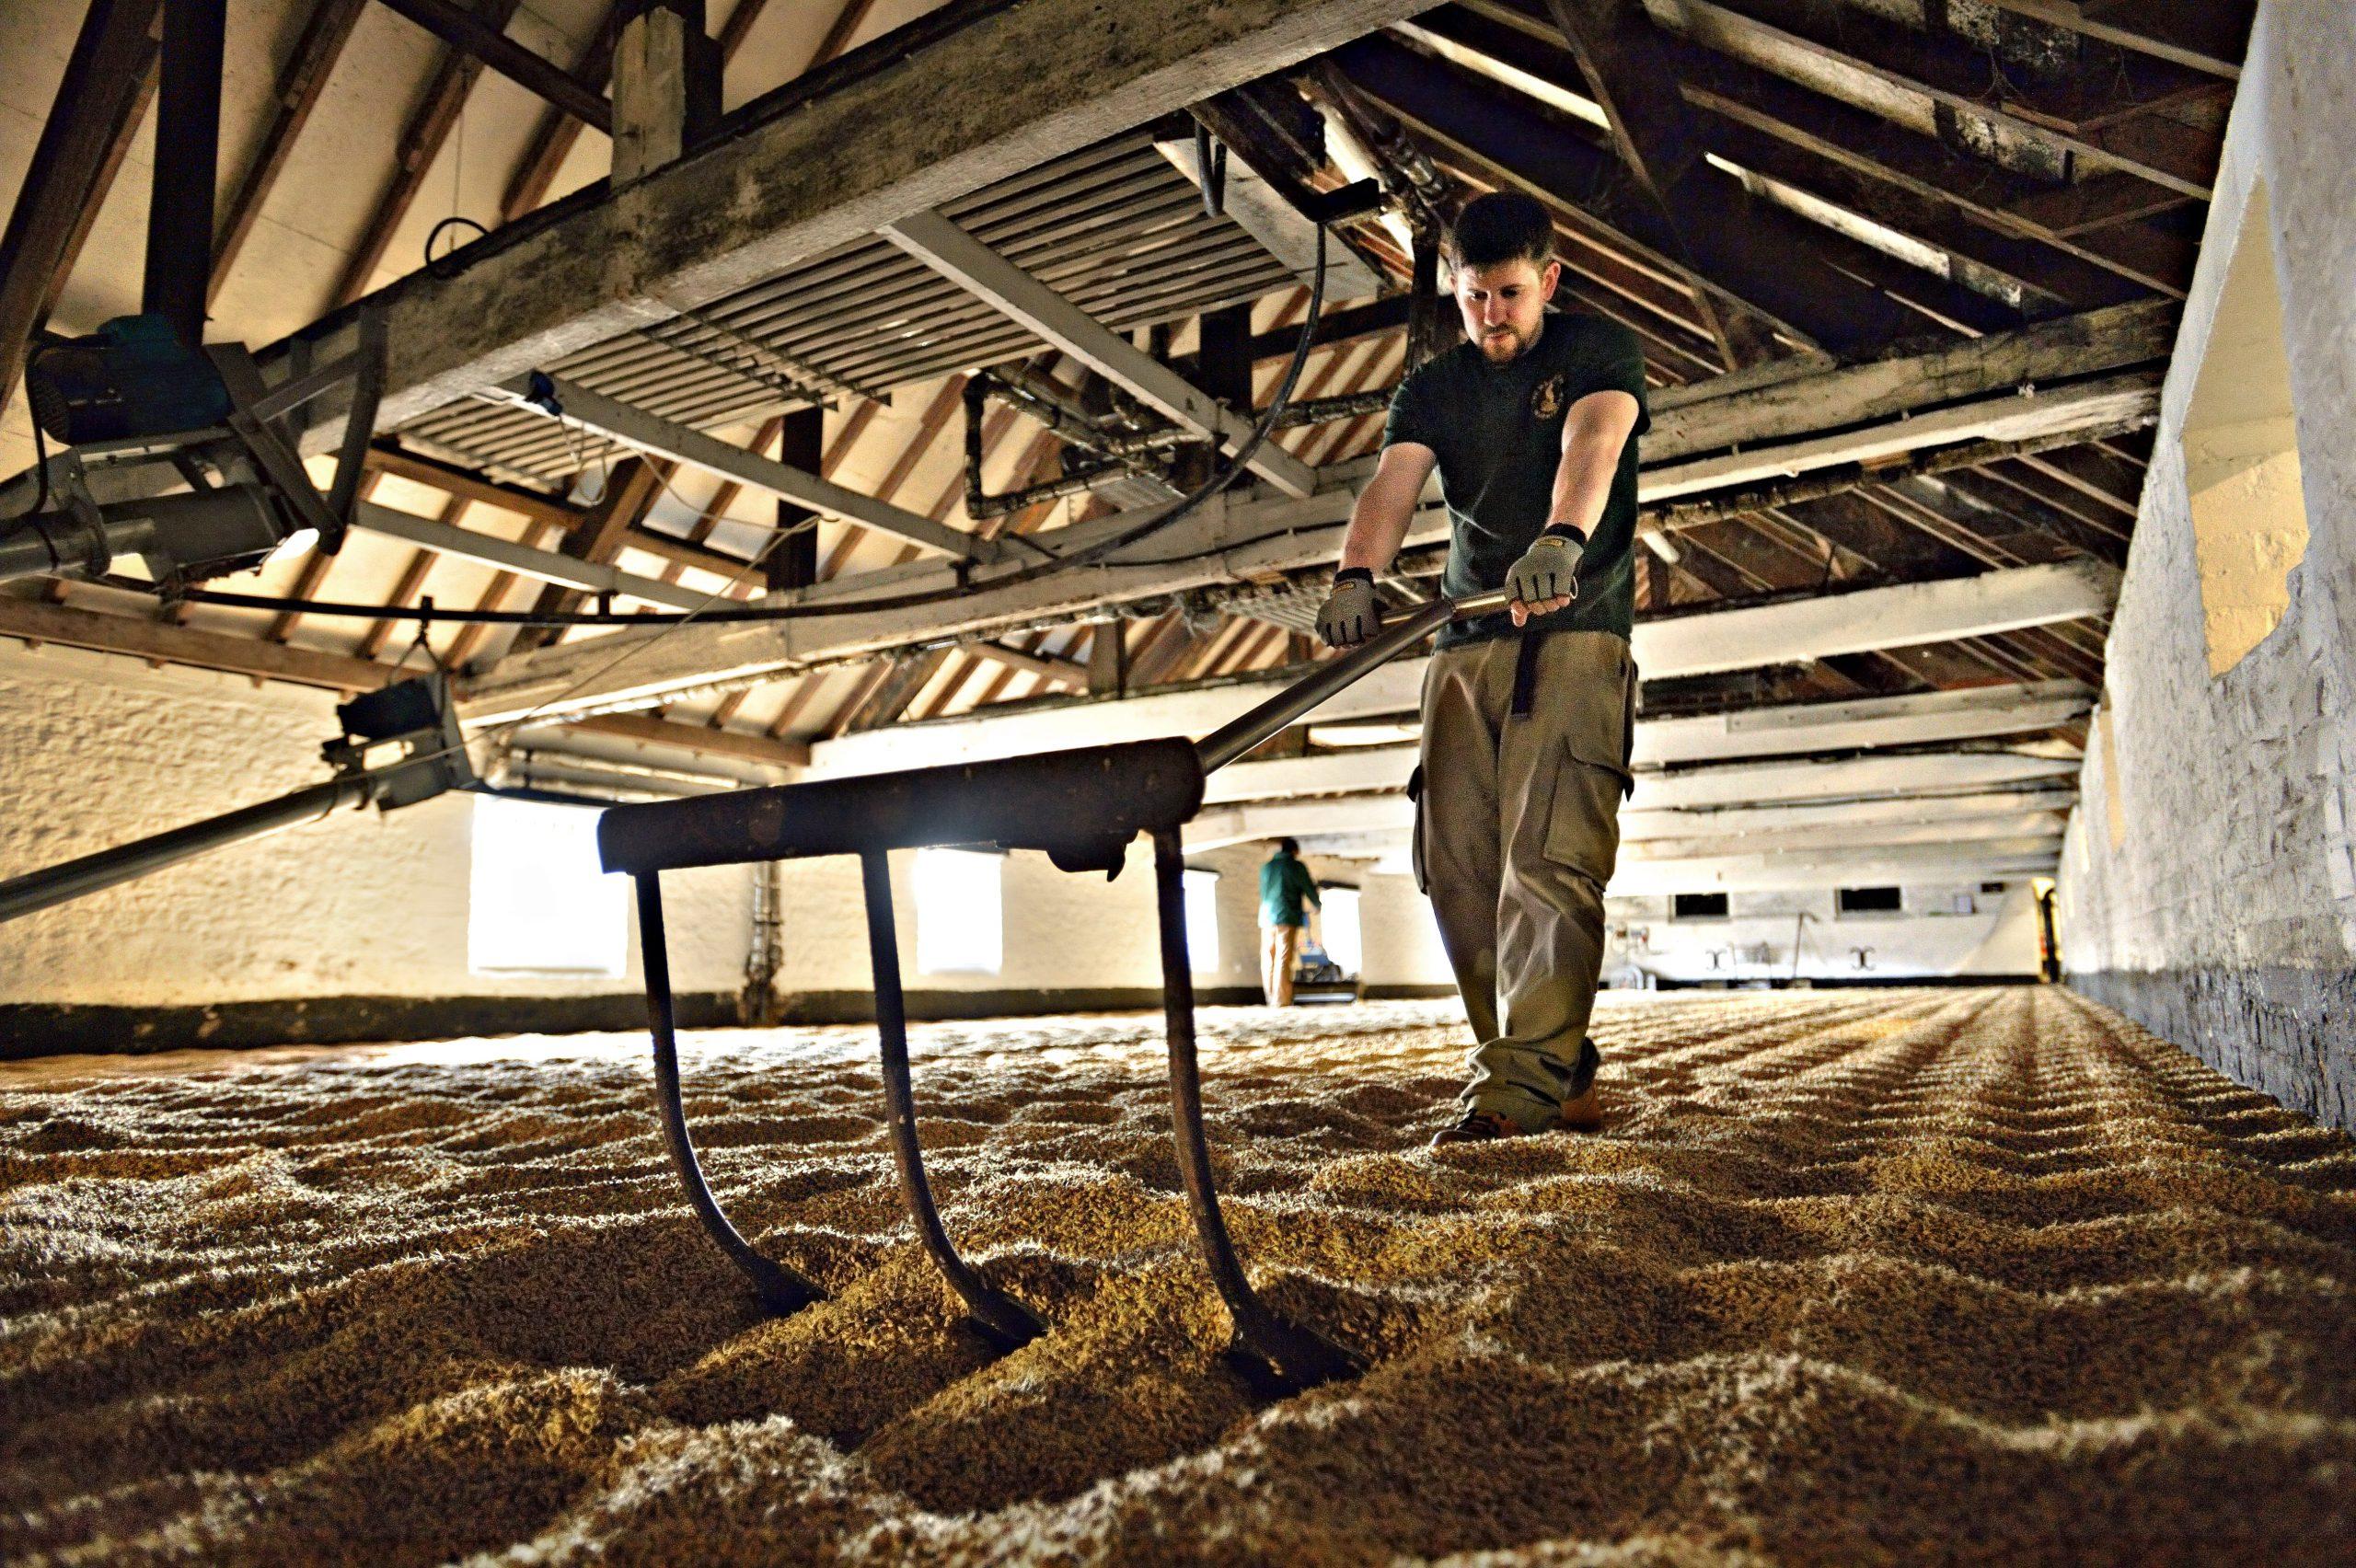 Warminster Maltings - Traditional English Floor Malt